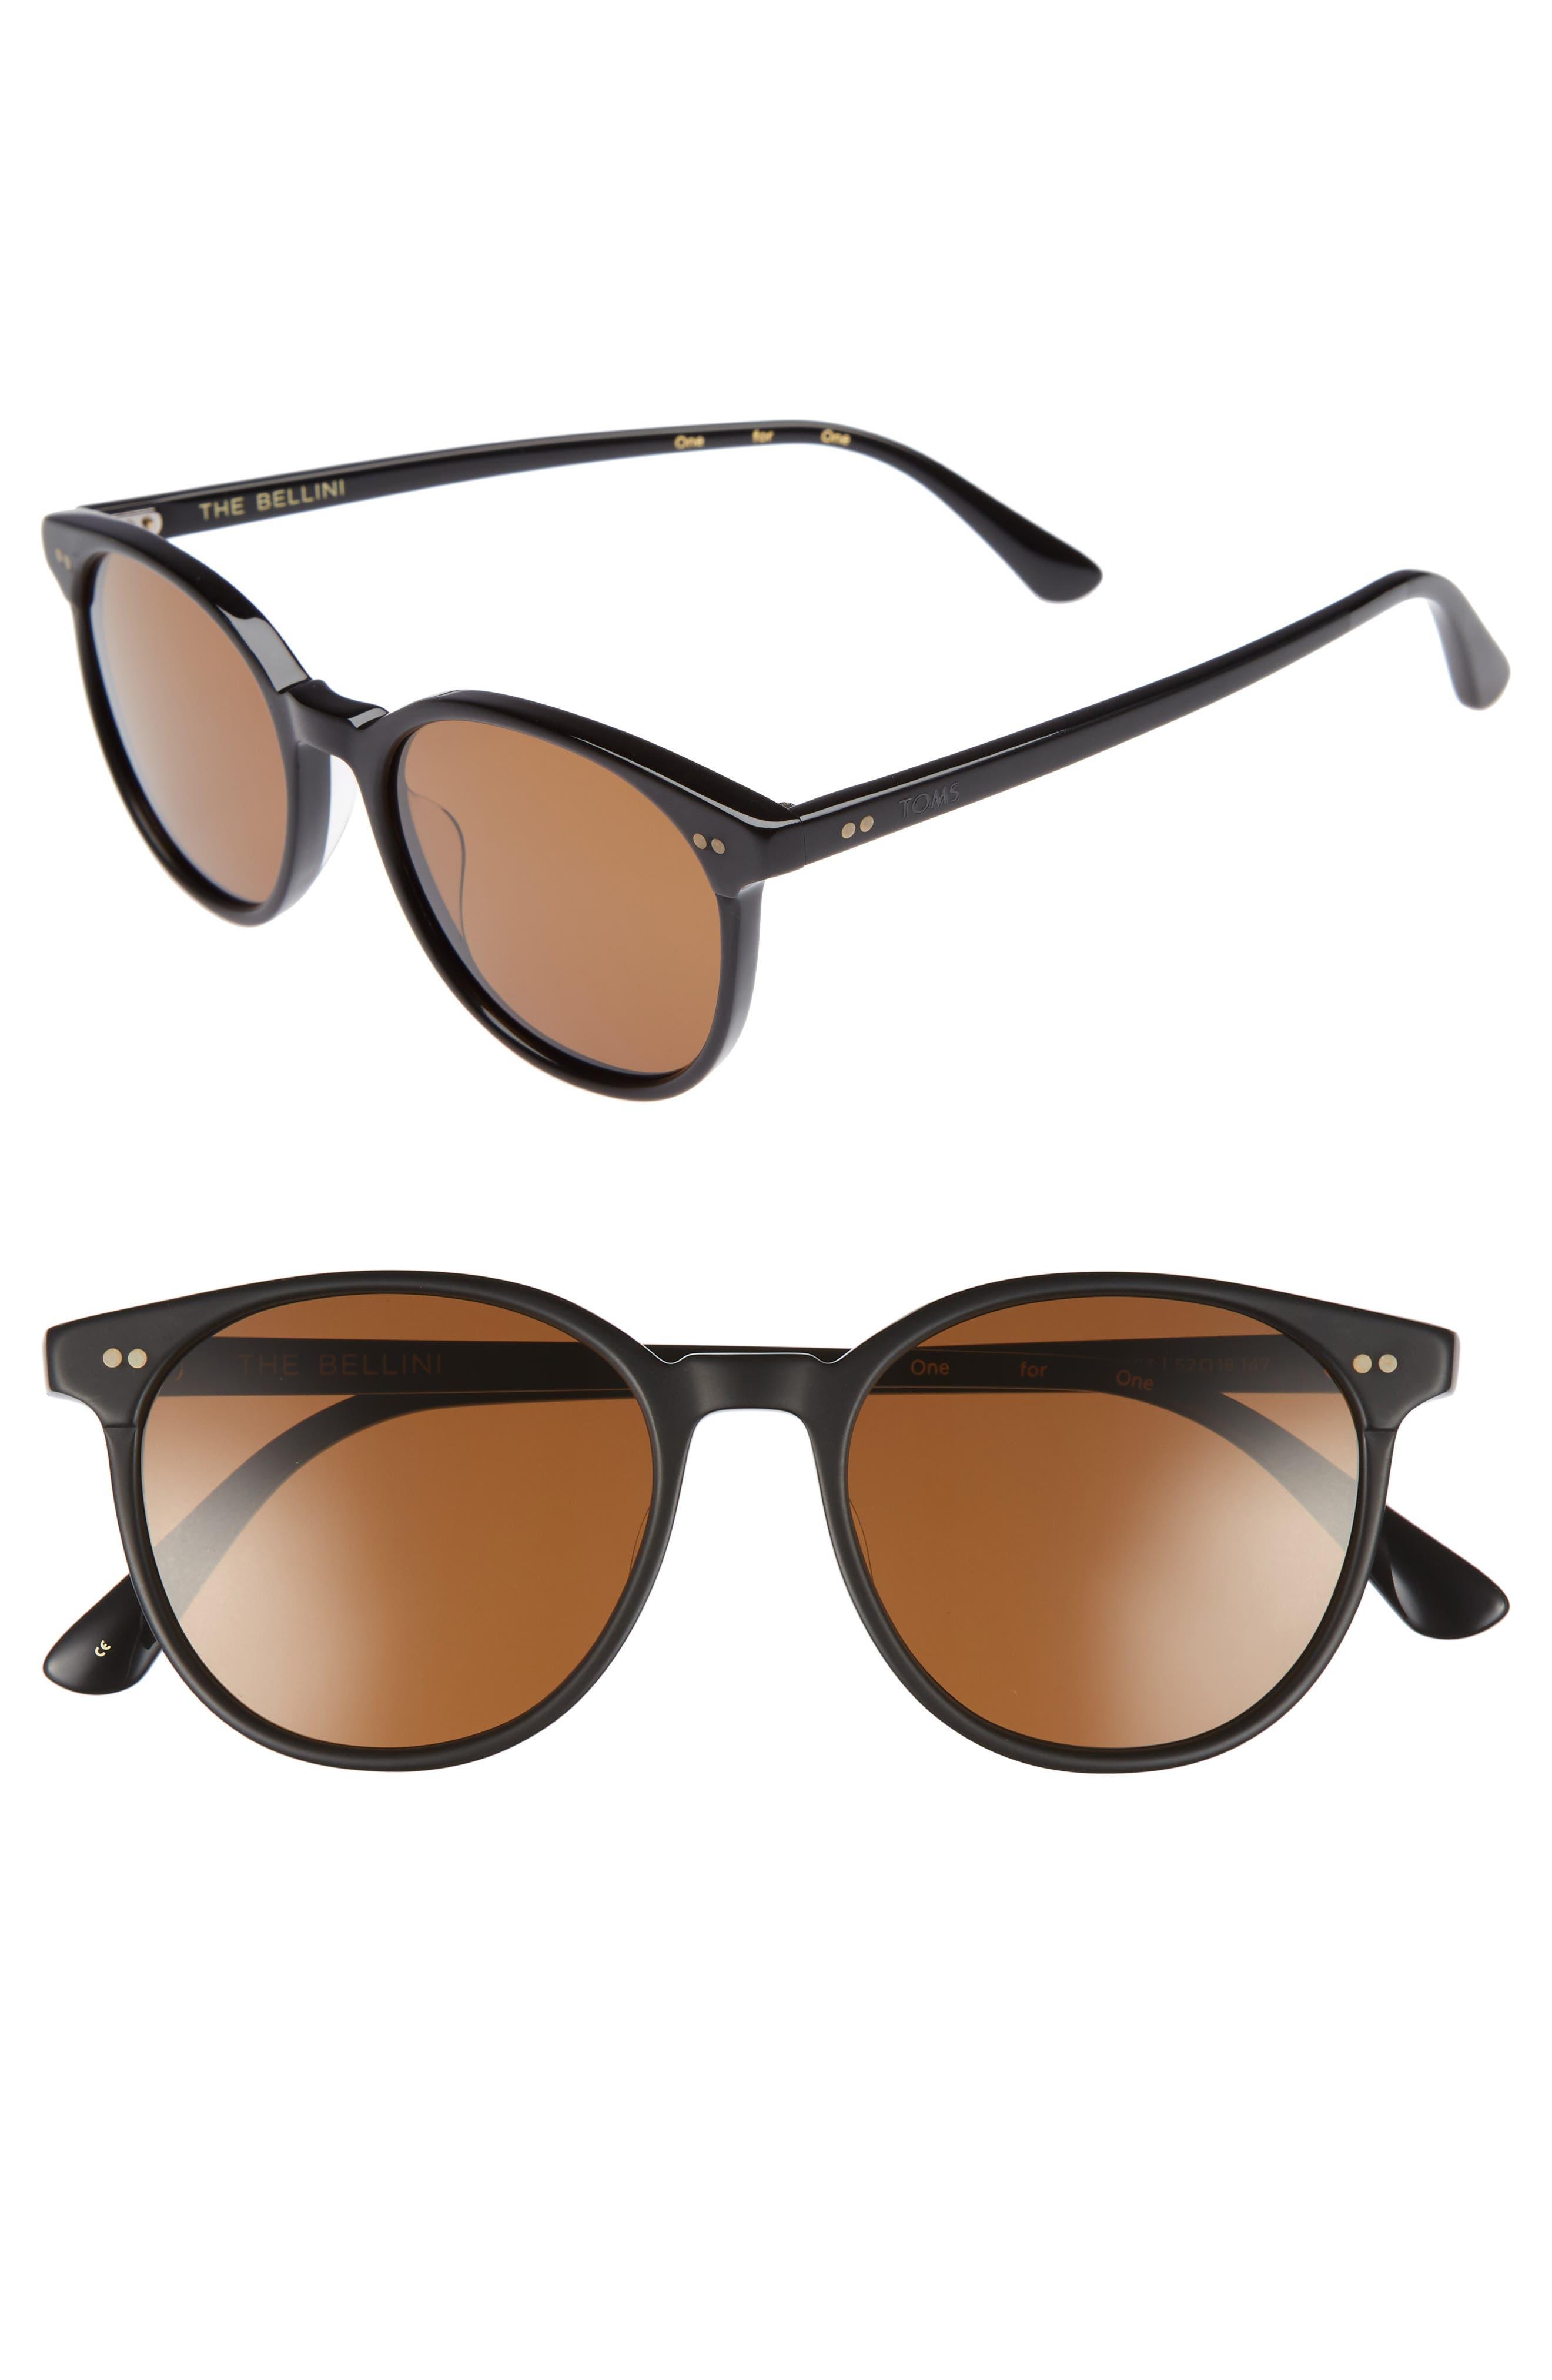 Bellini 52mm Sunglasses,                             Main thumbnail 1, color,                             Matte Black